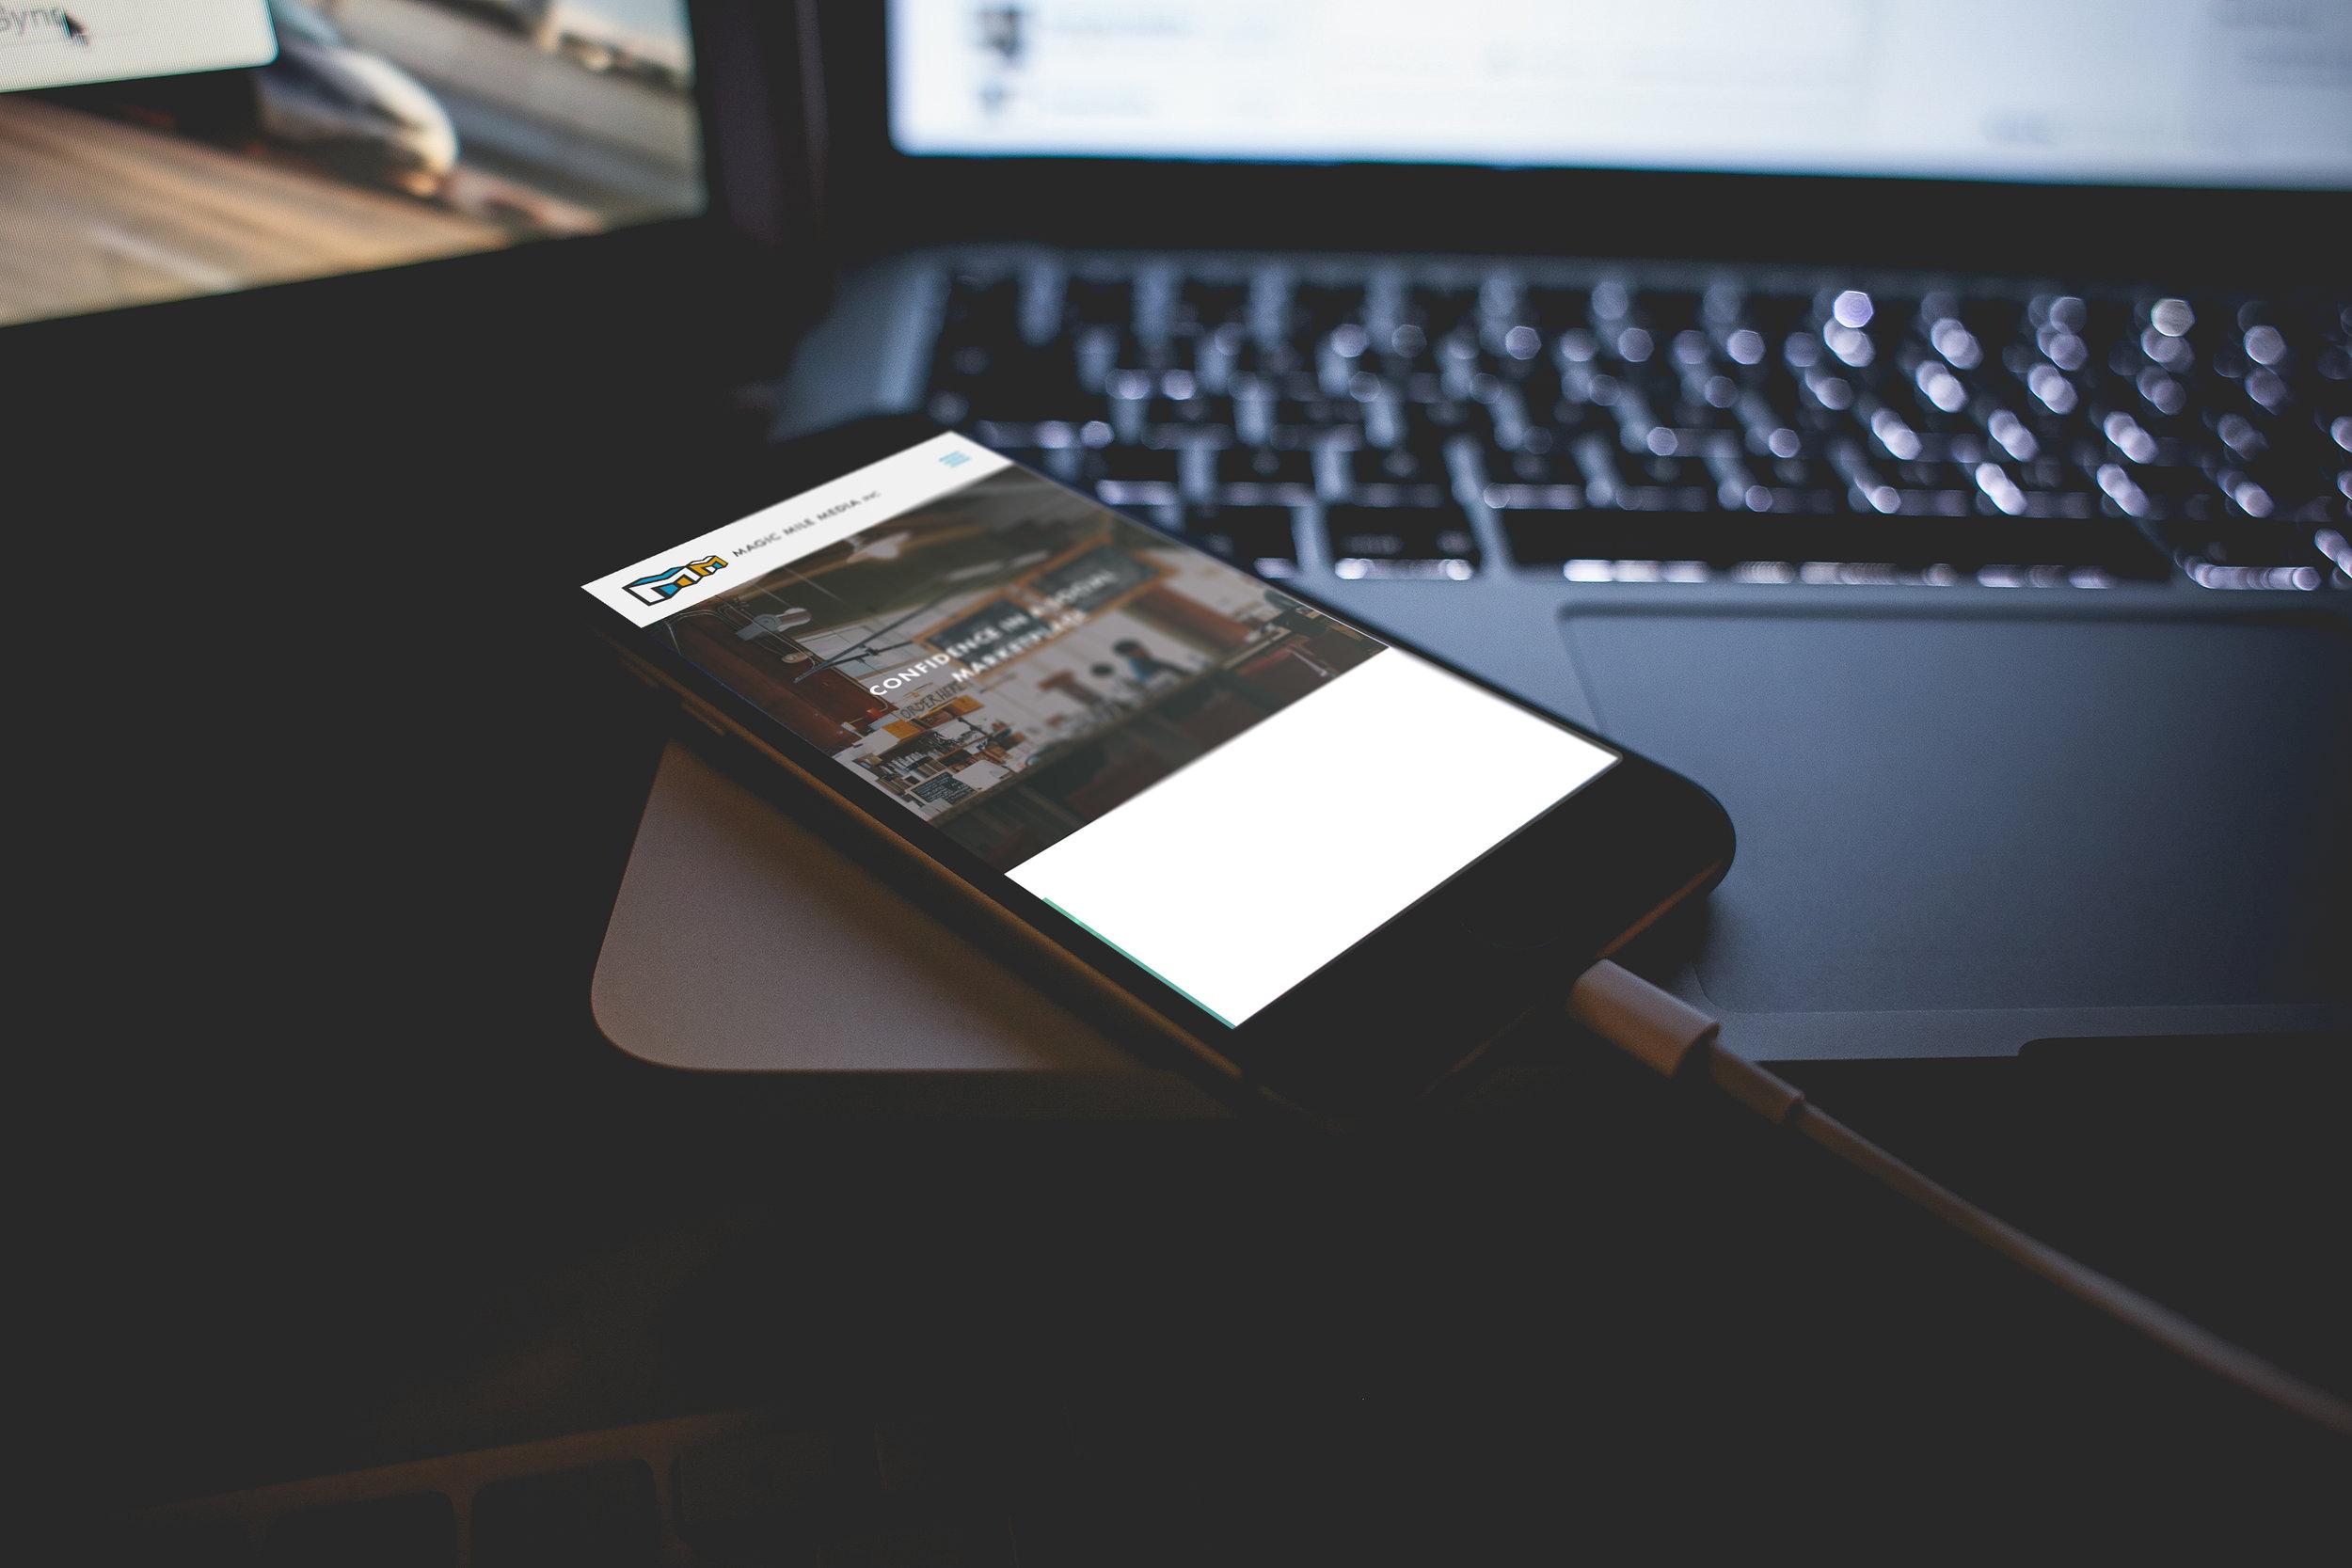 mobileblog2.jpg